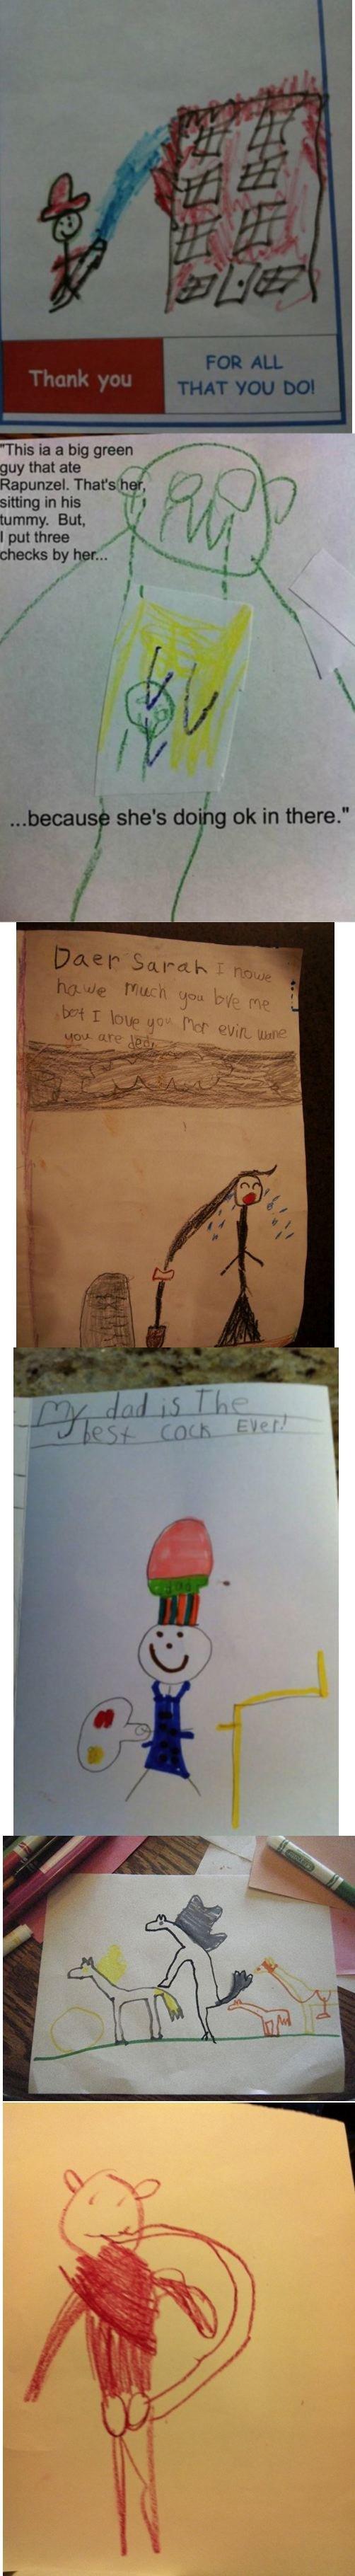 Kids these days.... source_ www.smosh.com/smosh-pit/photos/15-hilariously-disturbing-drawings-little-kids.